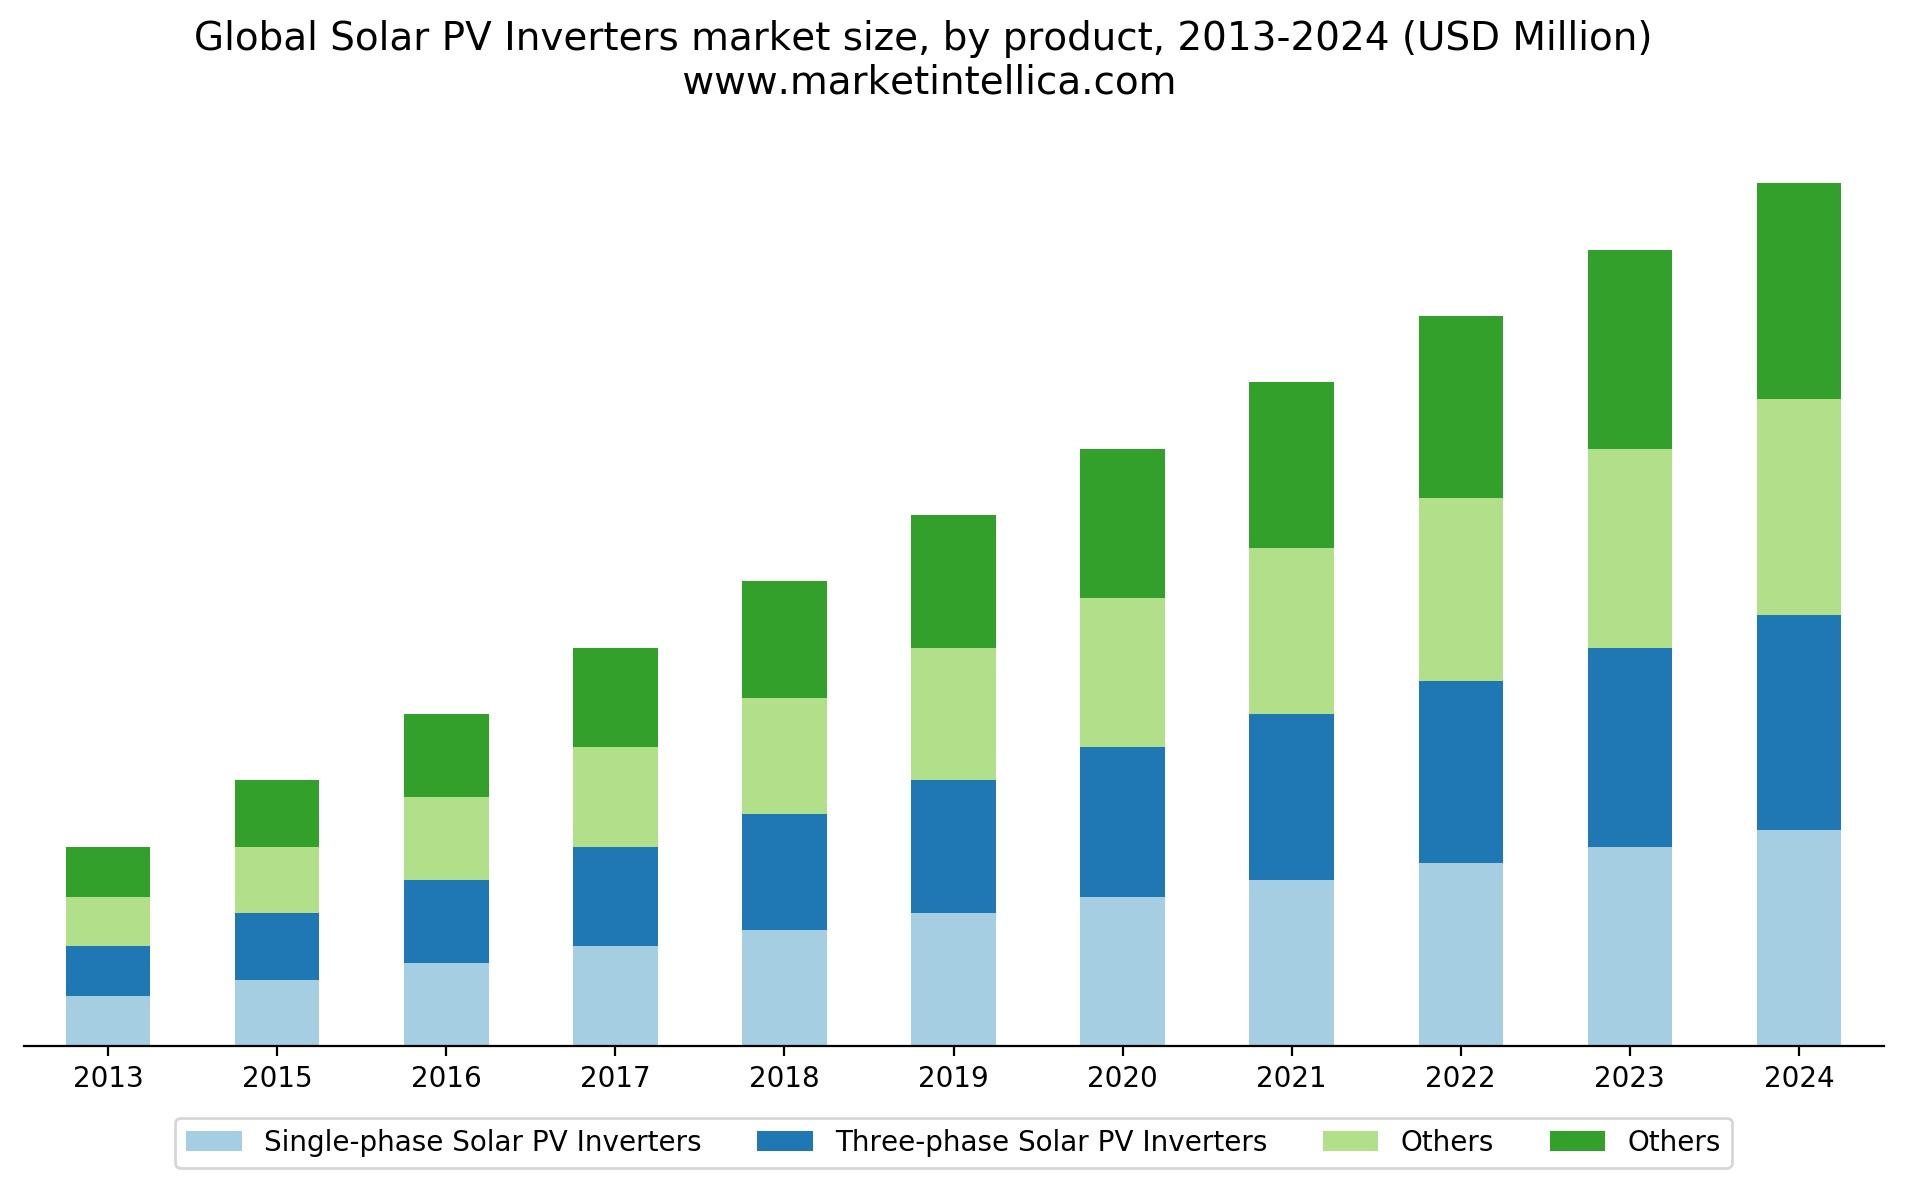 MI71565-global-solar-pv-inverters-market-research_producttypes.jpg